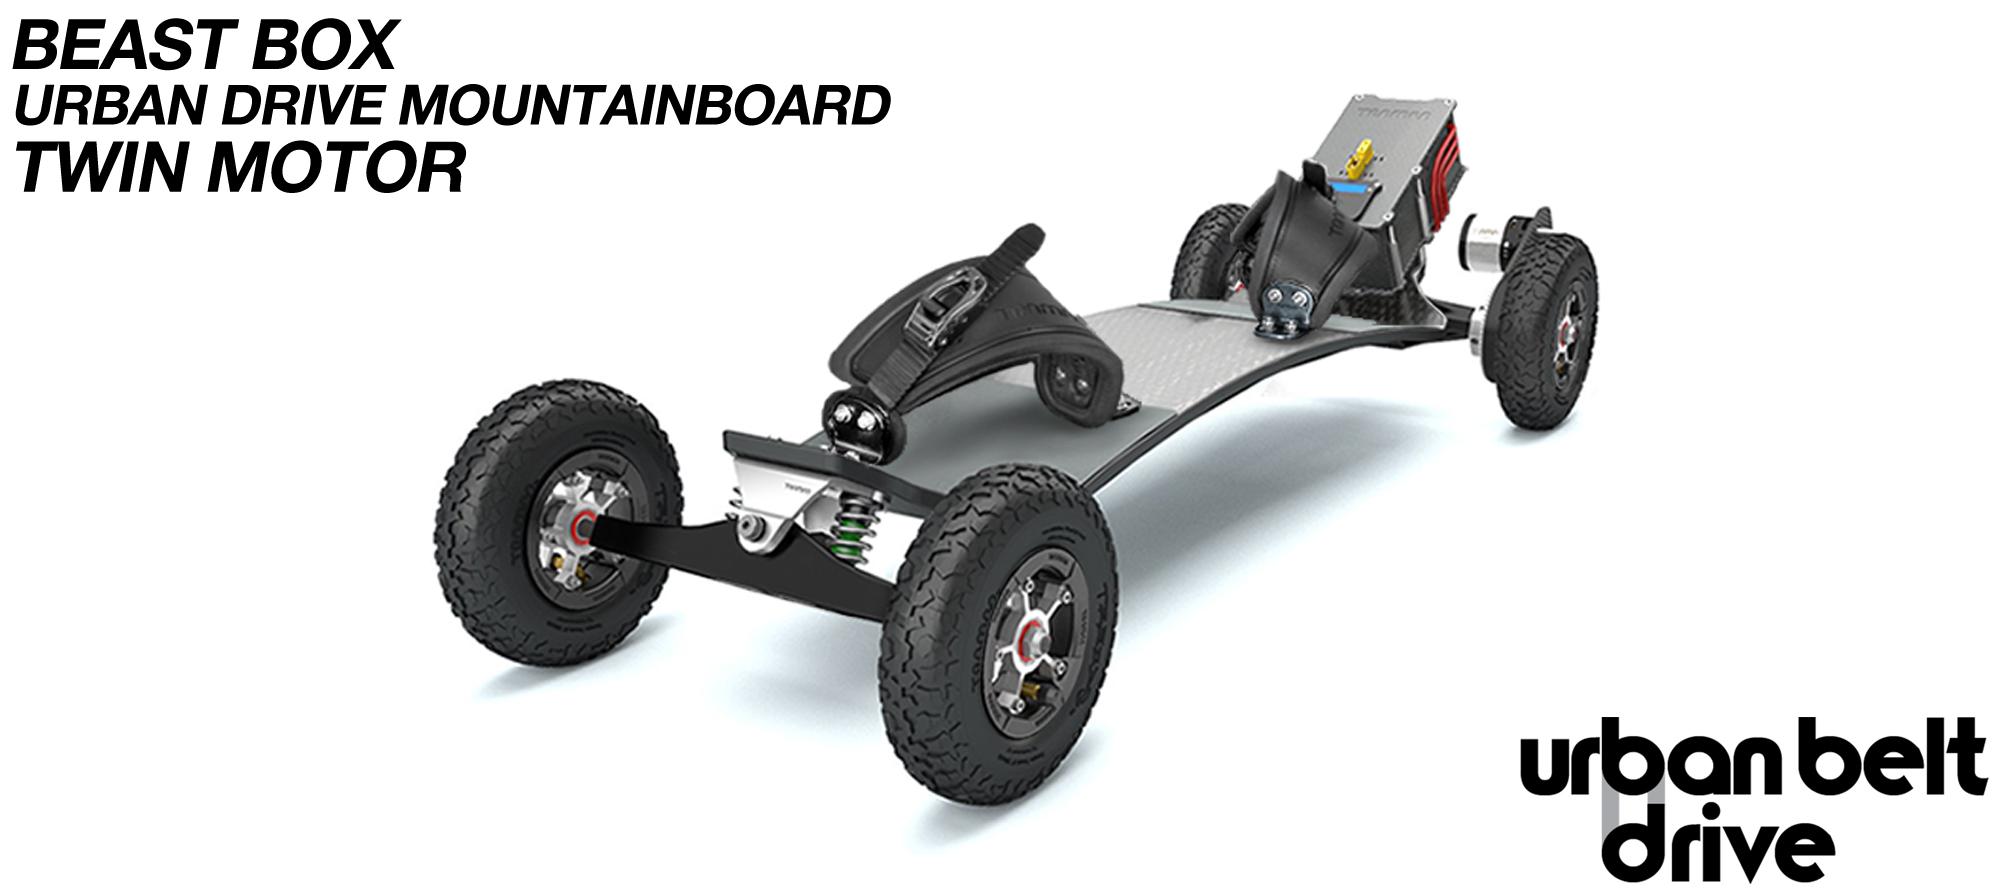 URBAN Electric Mountainboard - Urban Motor Mounts on Custom TRAMPA deck ATB Trucks 8 inch Wheels BEAST Box TWIN Motor with VESC